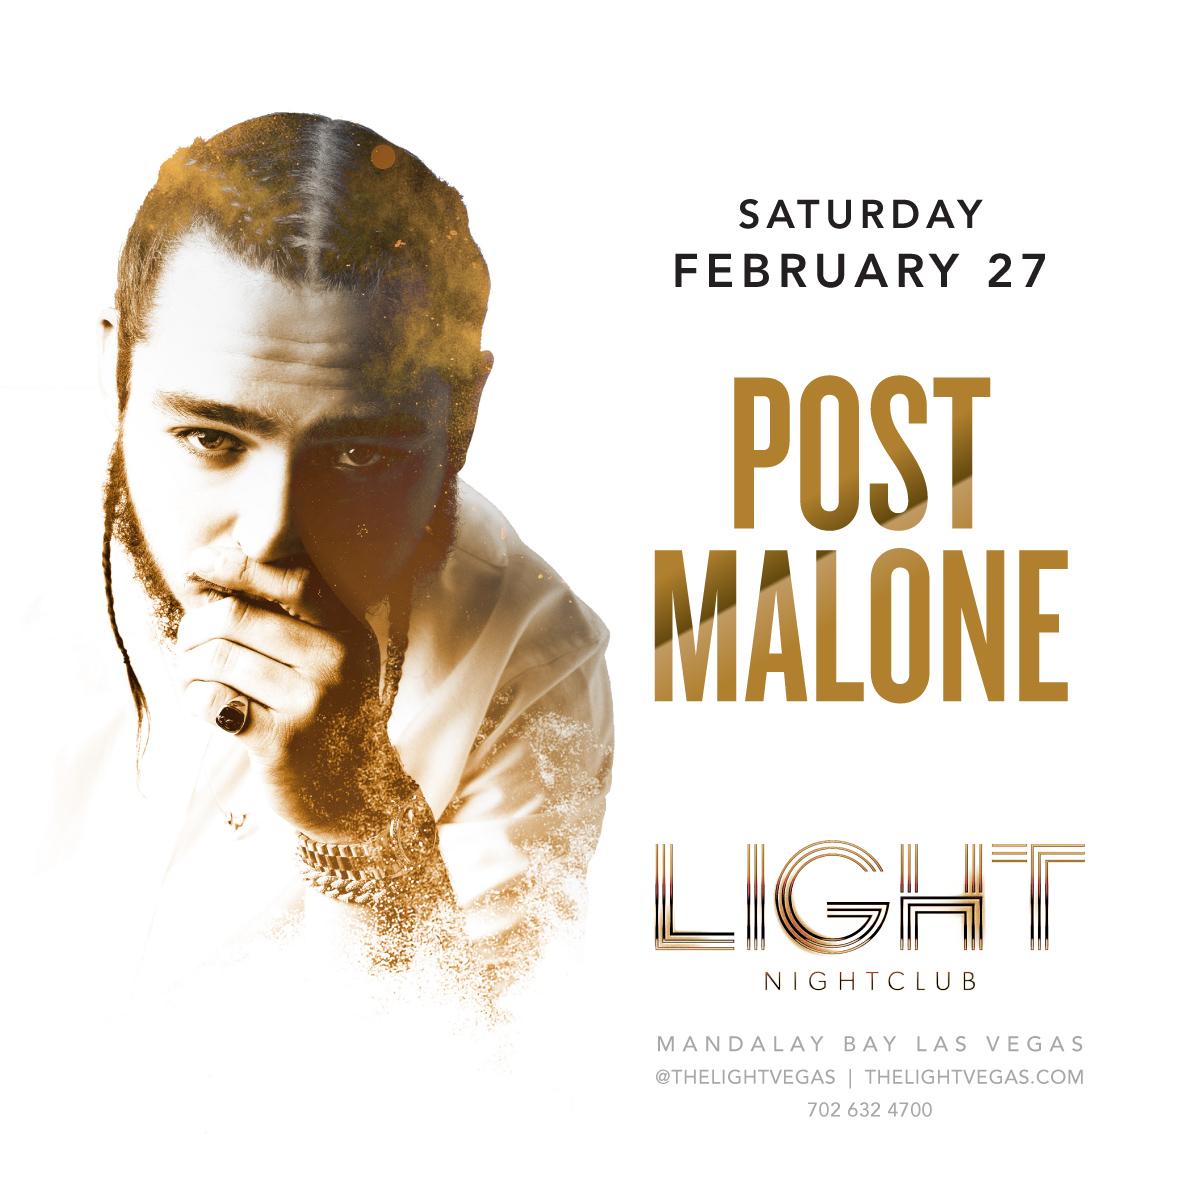 Post Malone At Light Nightclub On Saturday, February 27